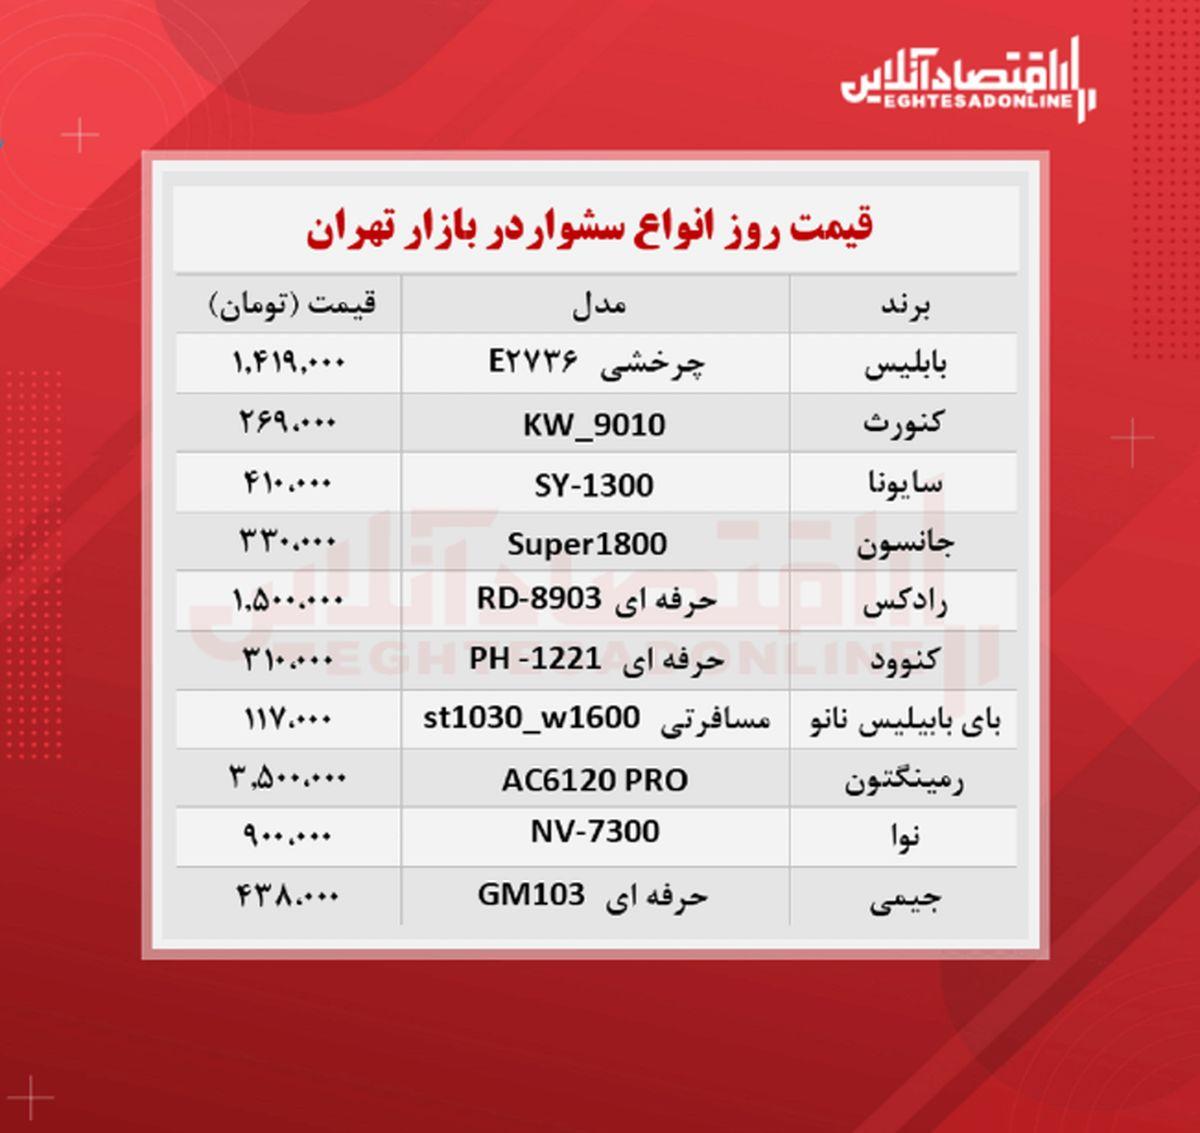 قیمت جدید سشوار (شهریور ۱۴۰۰)